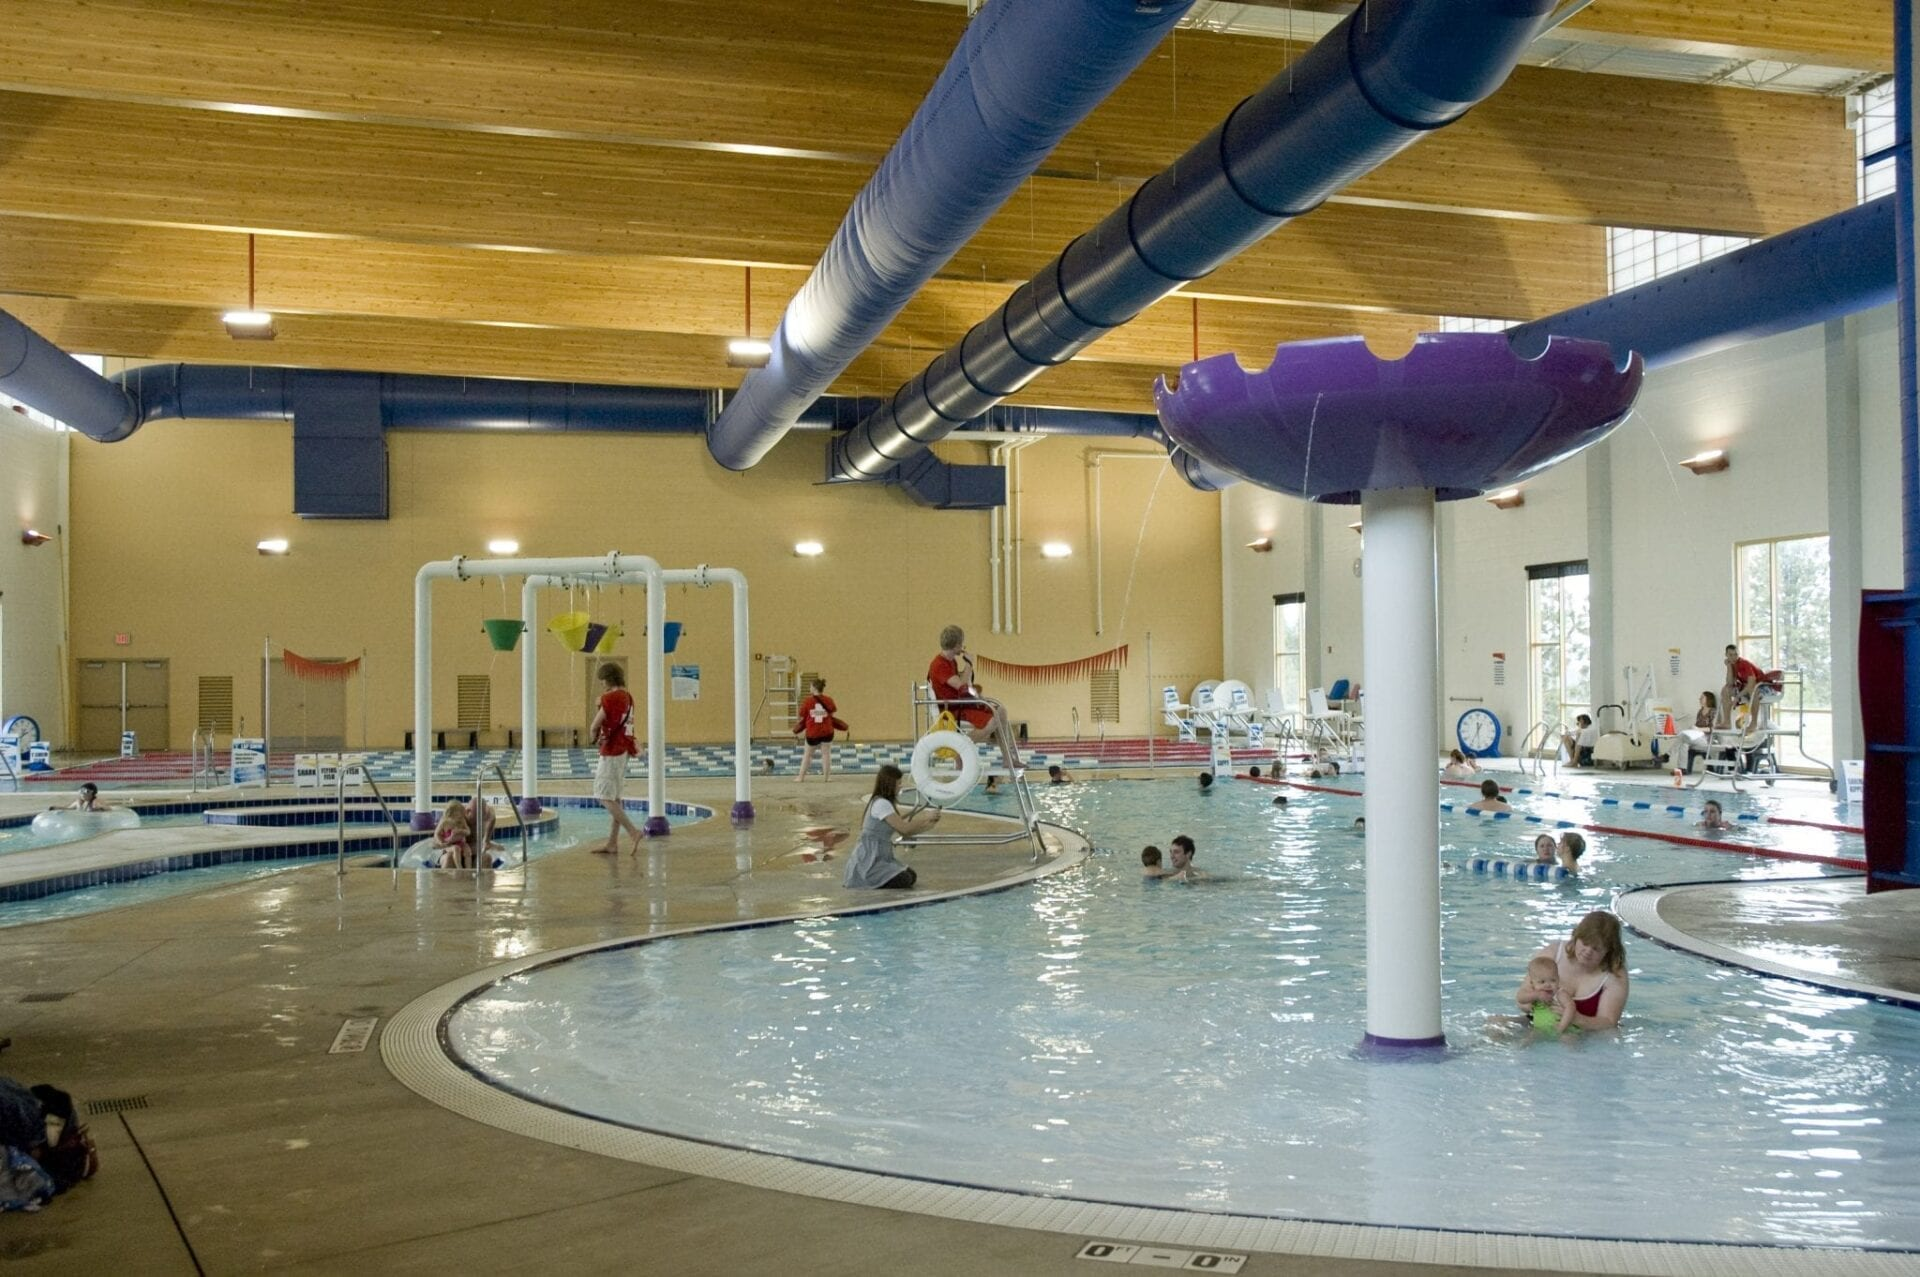 North Aquatic Center